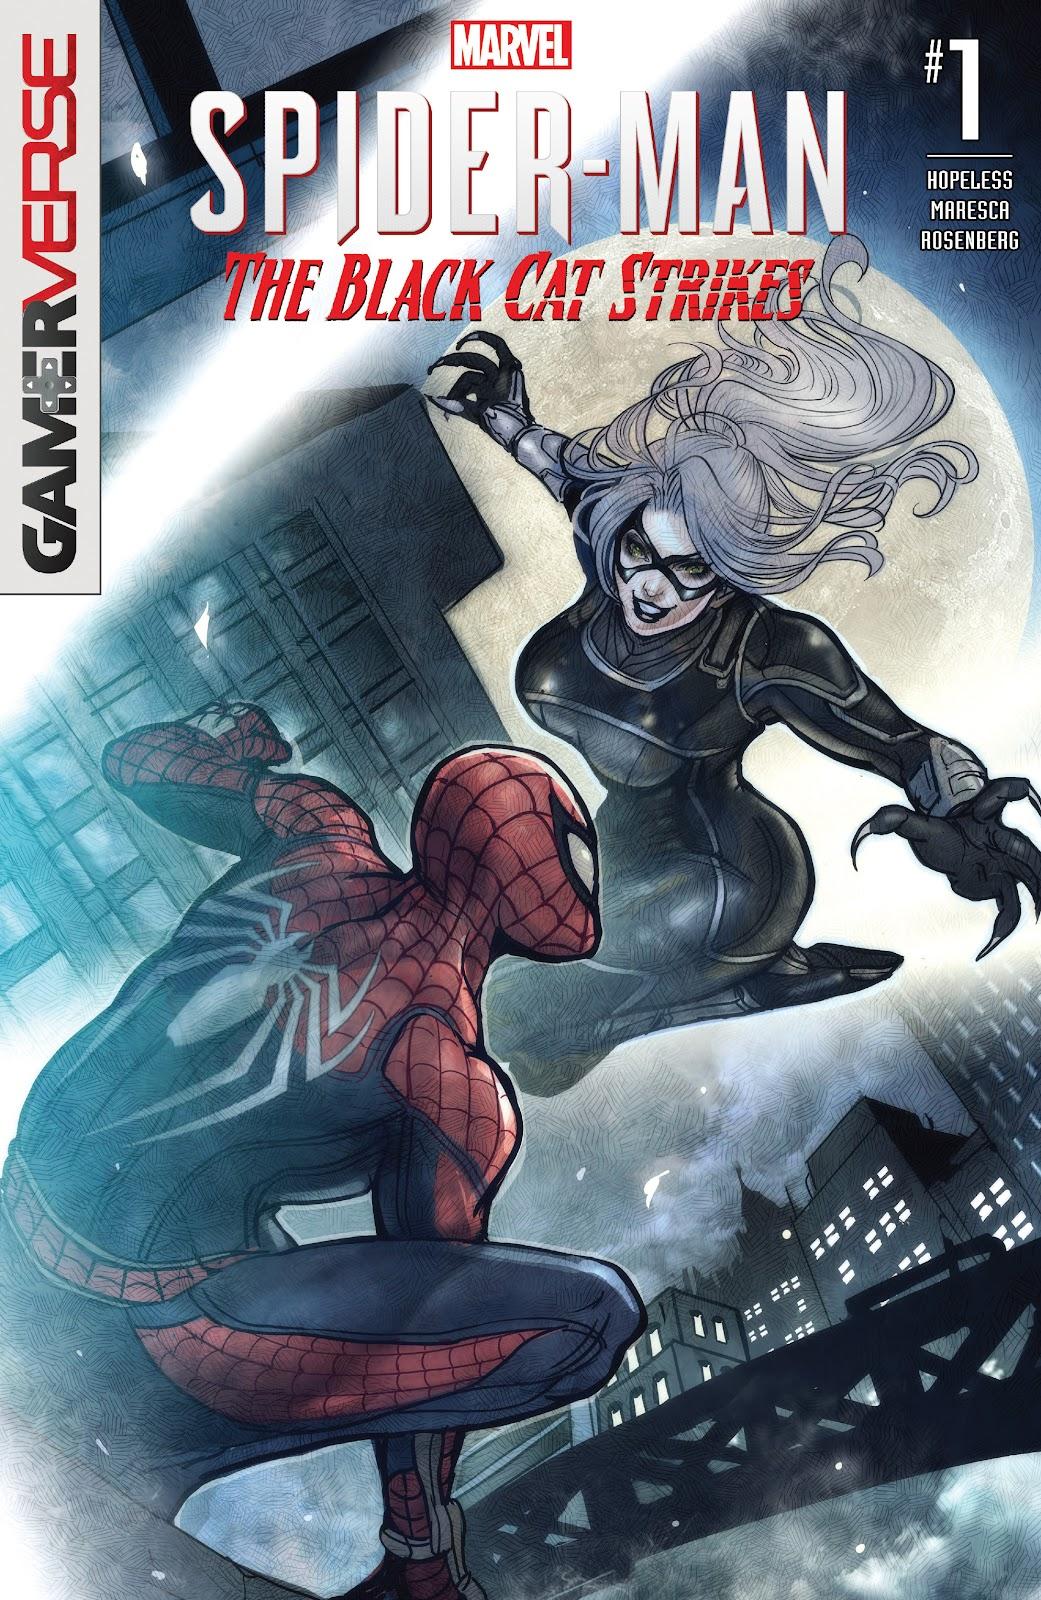 Marvel's Spider-Man: The Black Cat Strikes 1 Page 1